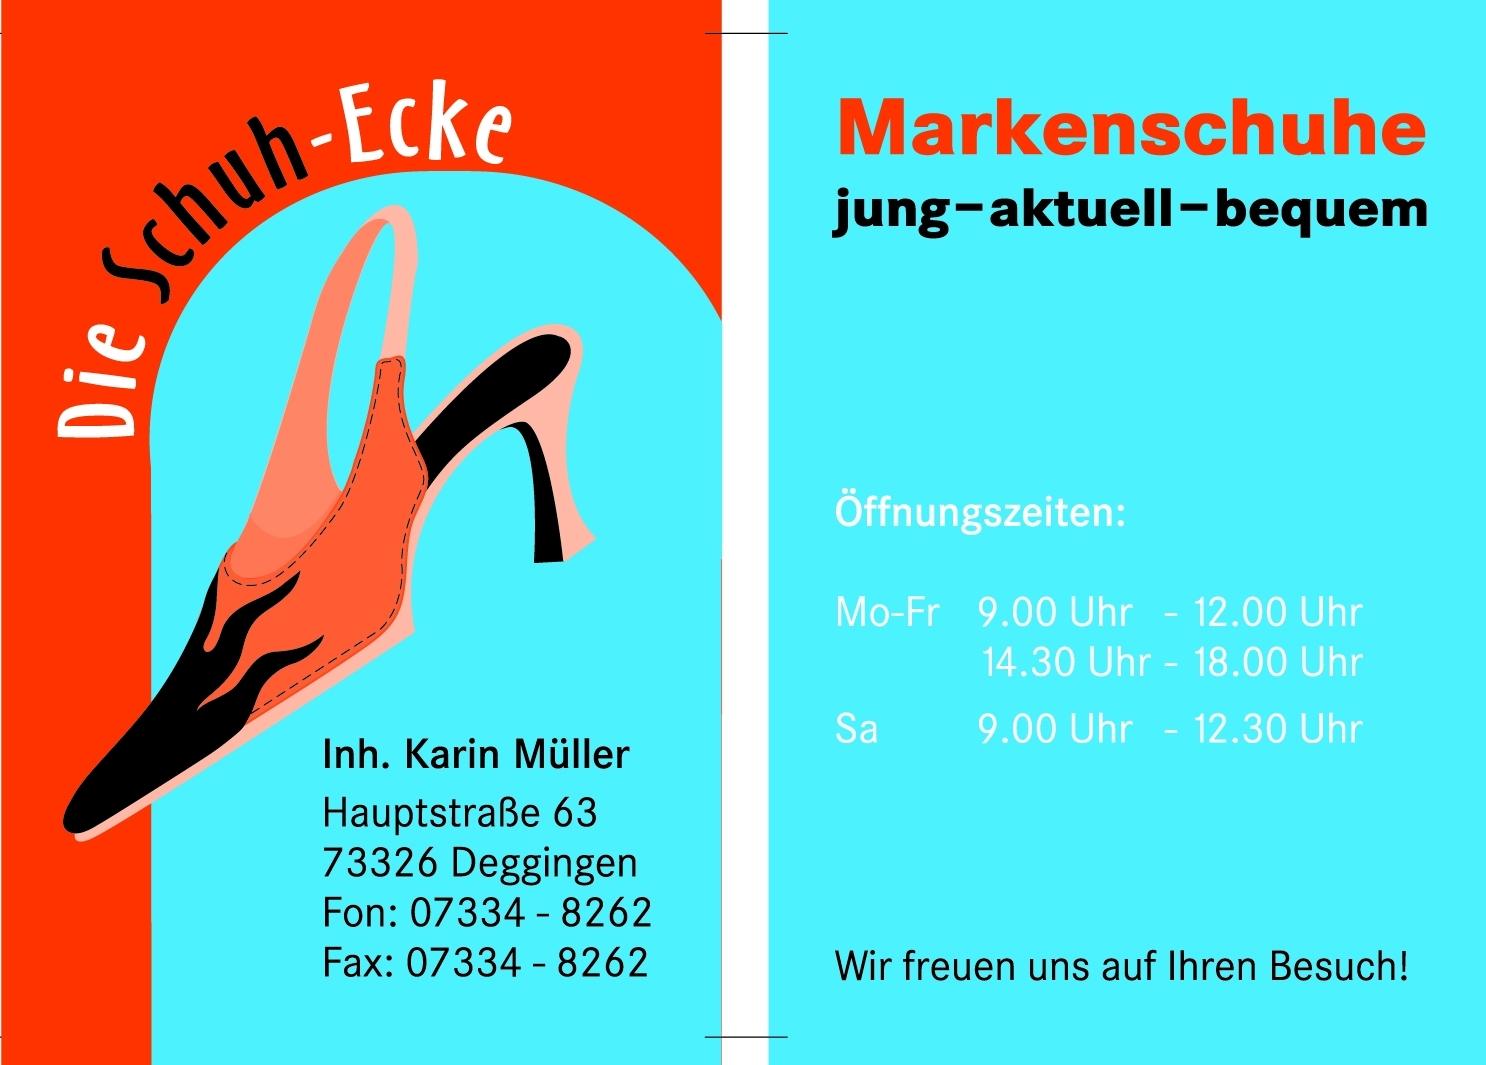 kleinhandel Schuhe Go 2 Shoe Company Westerheim Gmbh PqXfU